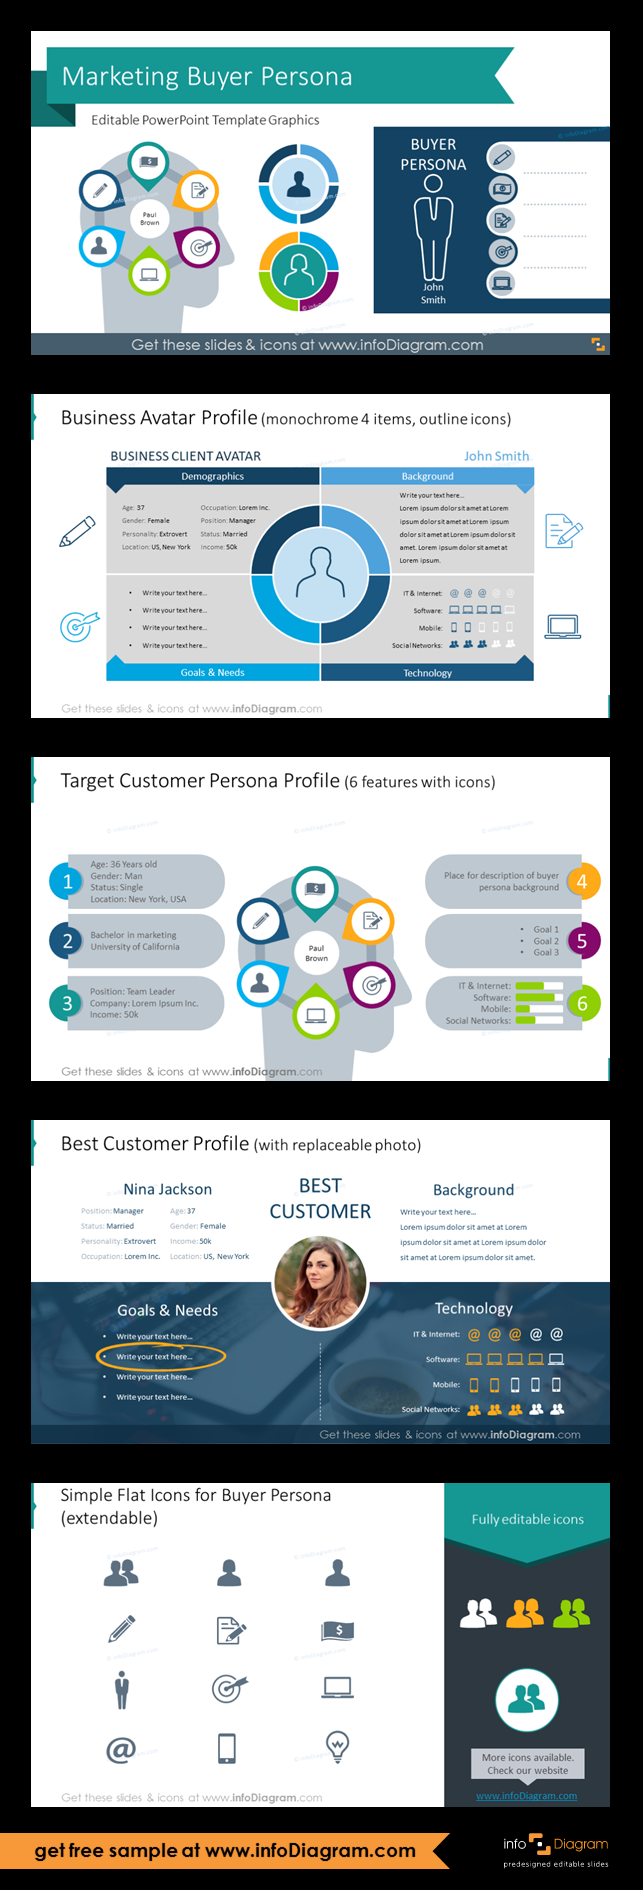 9 31 Marketing Buyer Persona Powerpoint Template Sales Avatar Icons Buyer Personas Persona Marketing Buyer Persona Template